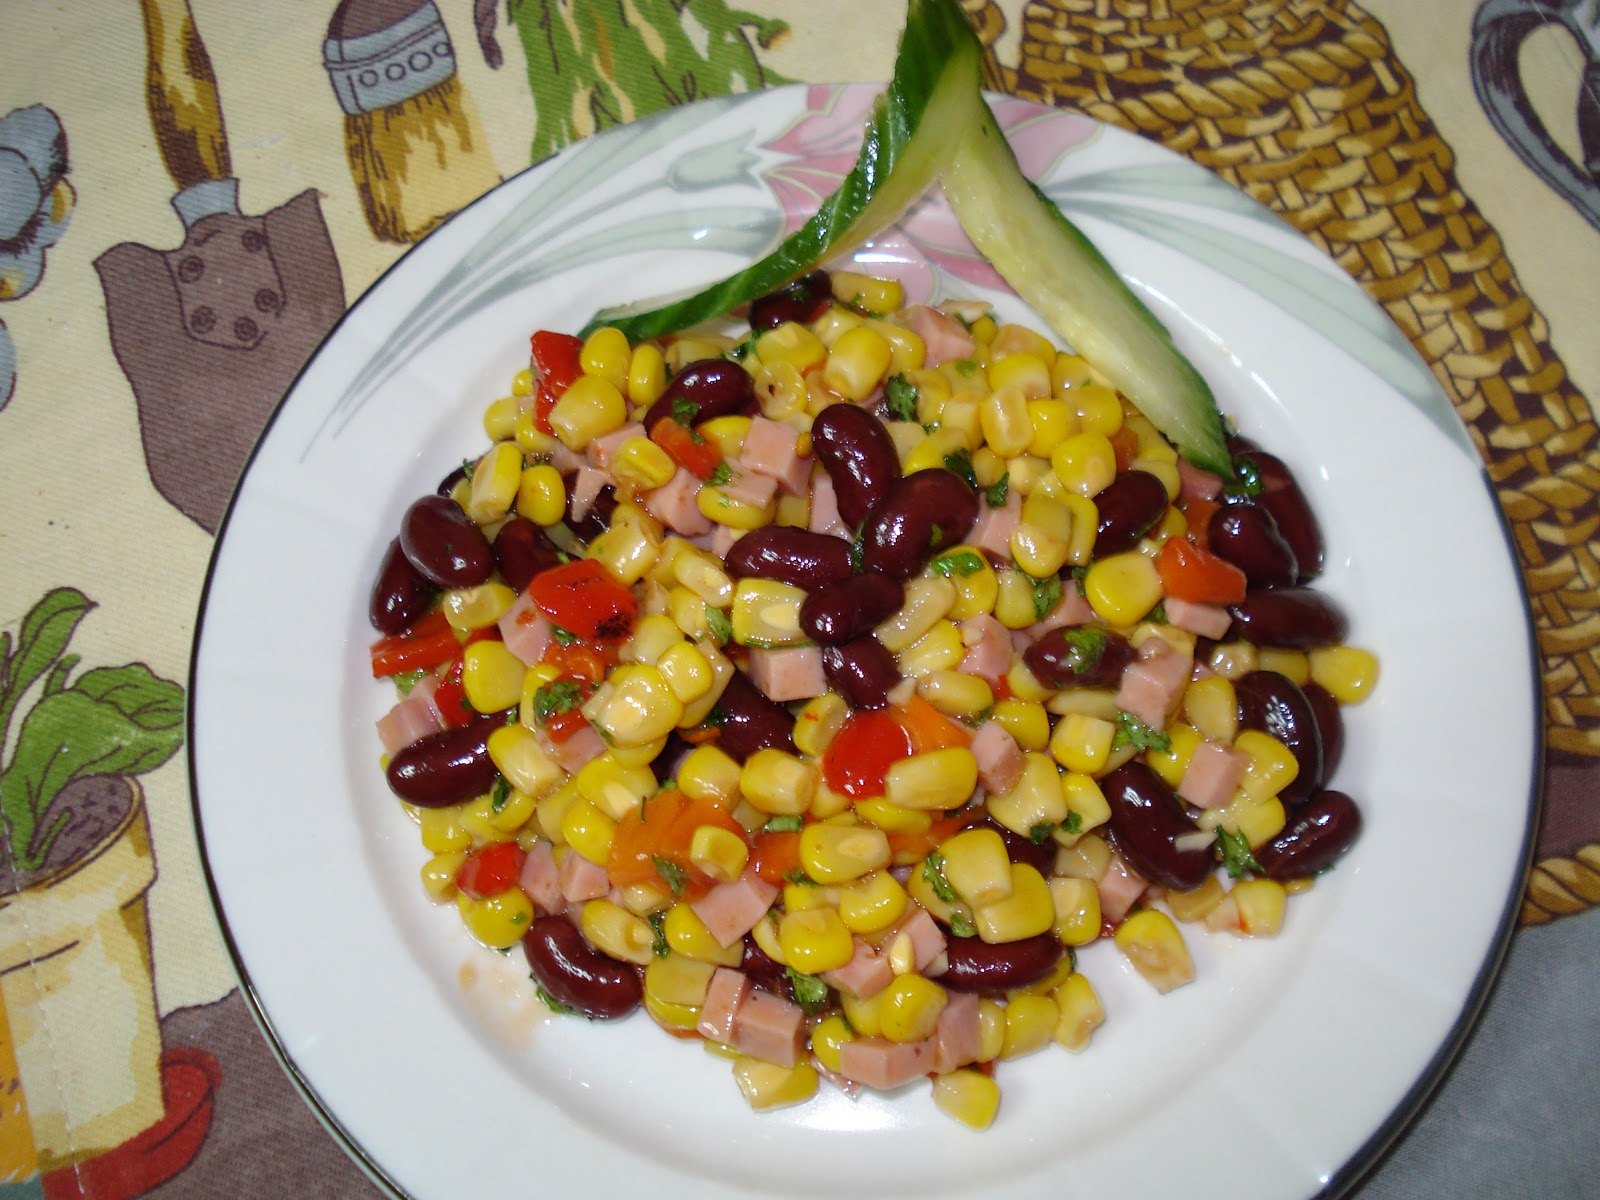 Салат из фасоли и риса 22 фотография